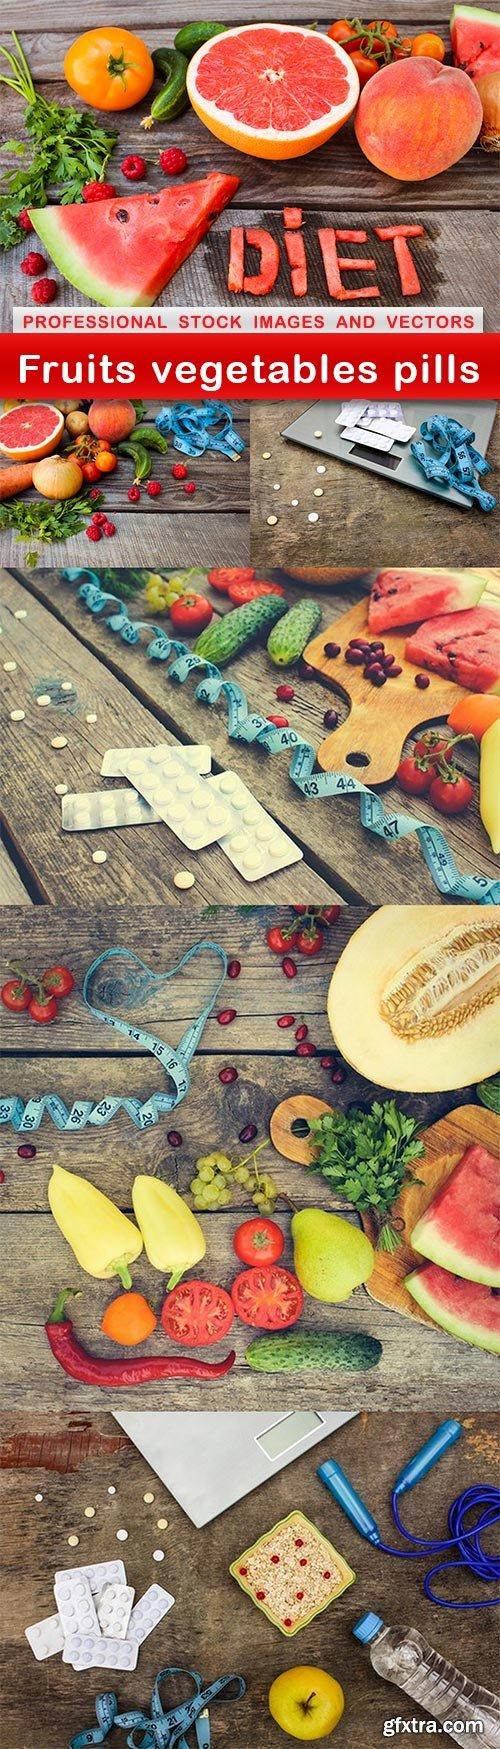 Fruits vegetables pills - 6 UHQ JPEG